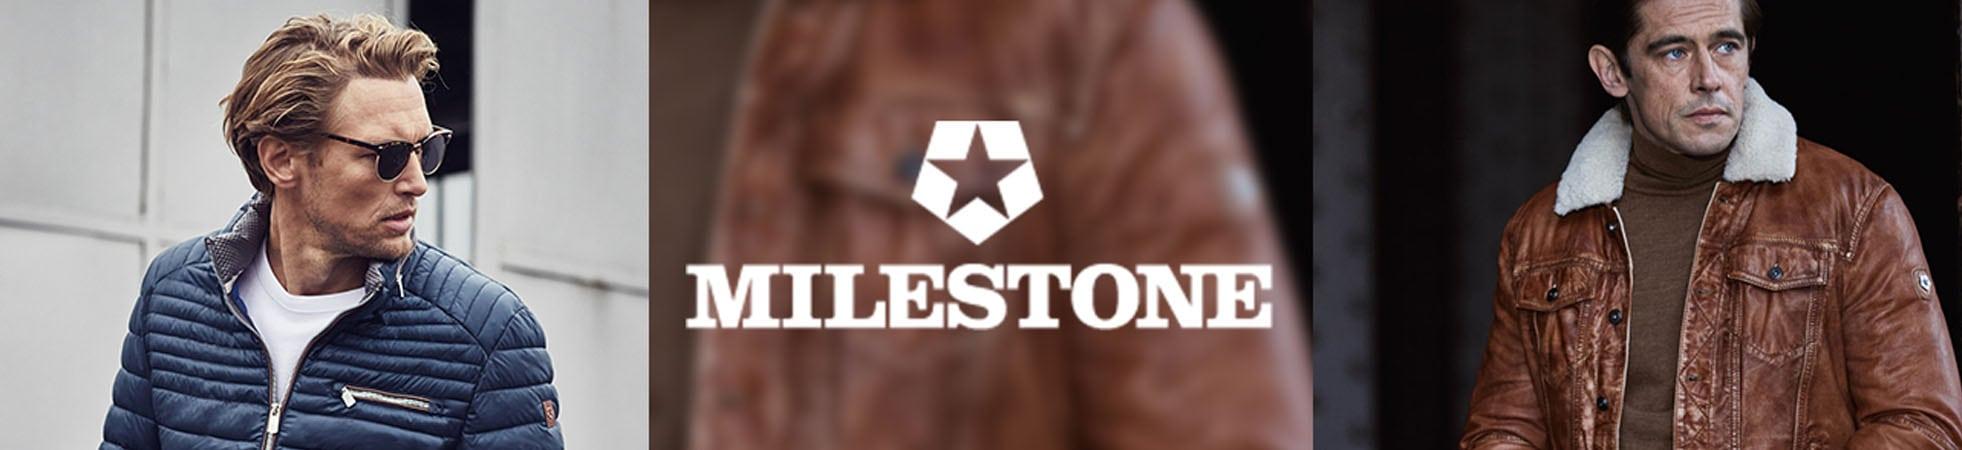 Milestone Herrenjacke